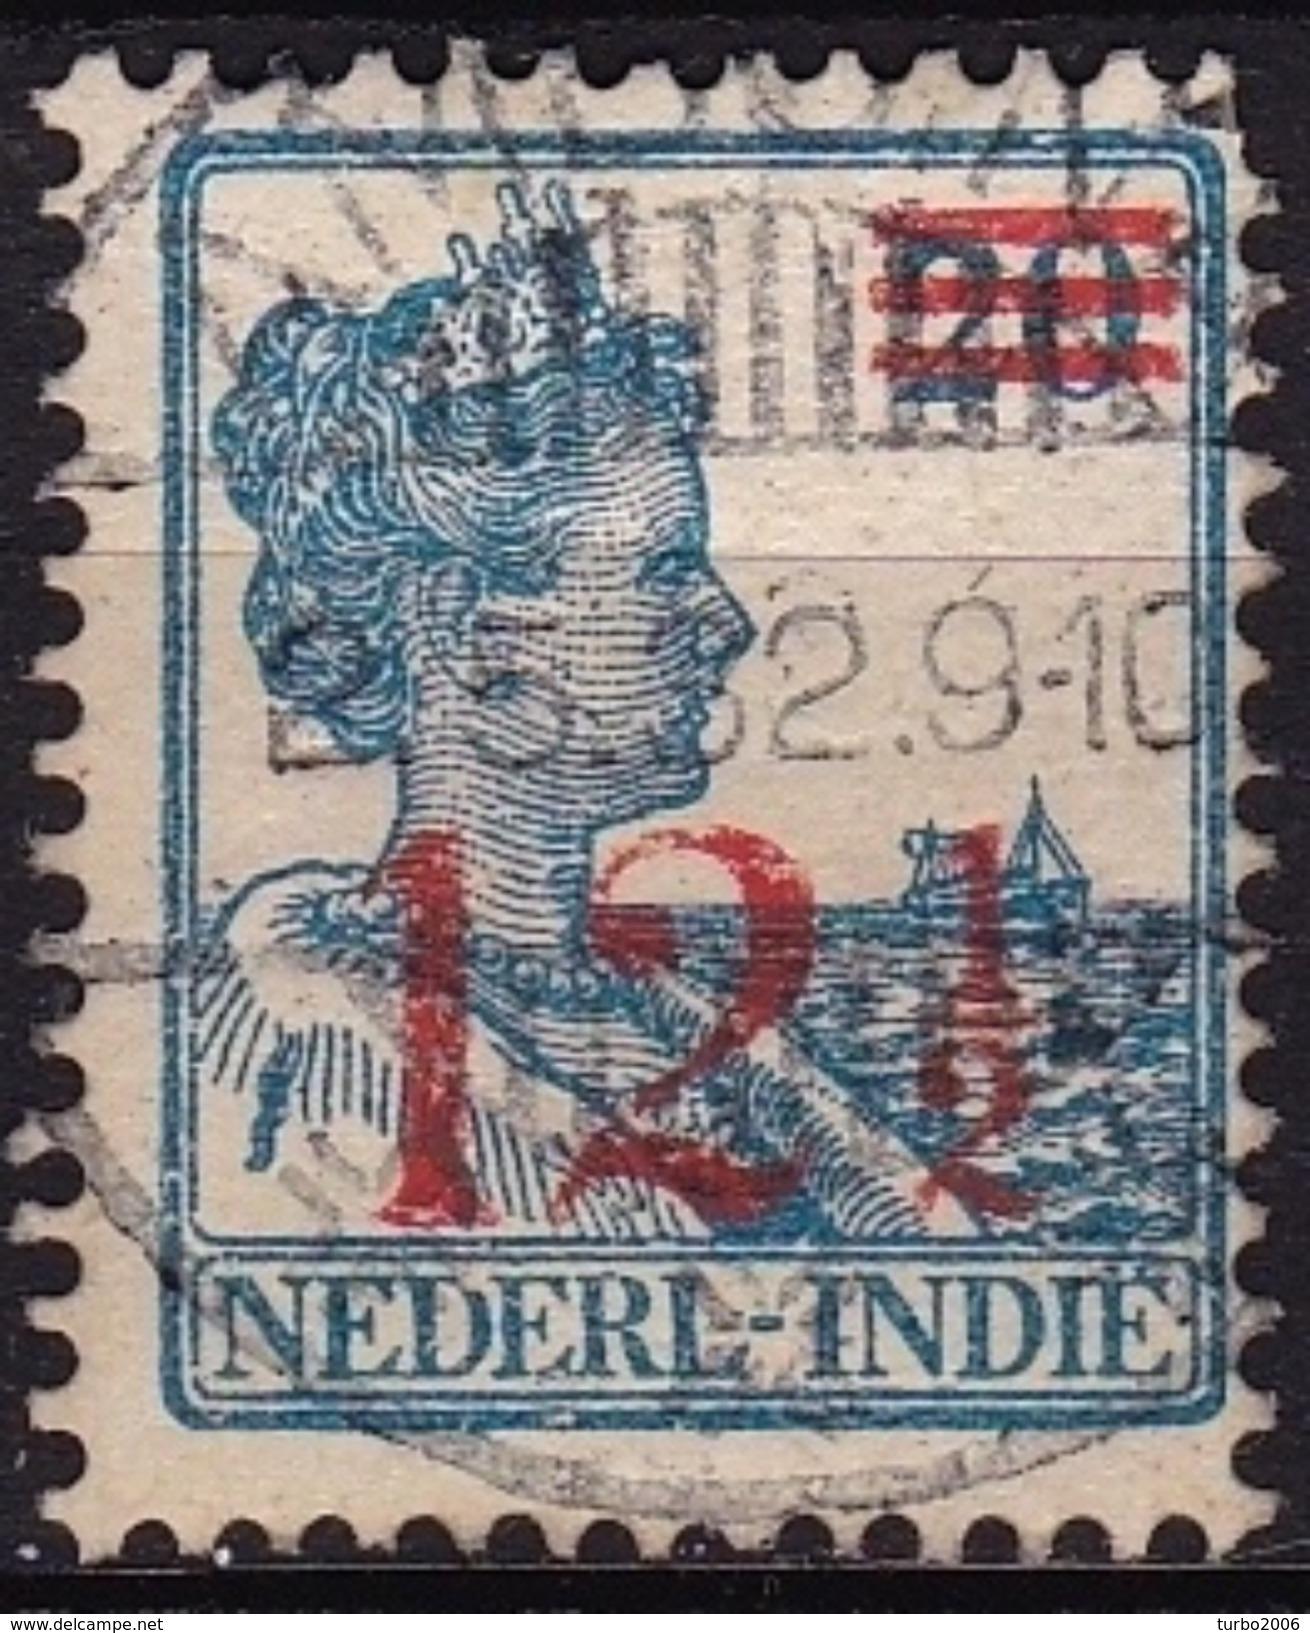 Ned. Indië: Langebalkstempel AMBOINA (13) Op 1930 Koningin Wilhelmina Hukpuitgifte 12½ / 20 Cent NVPH 171 - Indes Néerlandaises